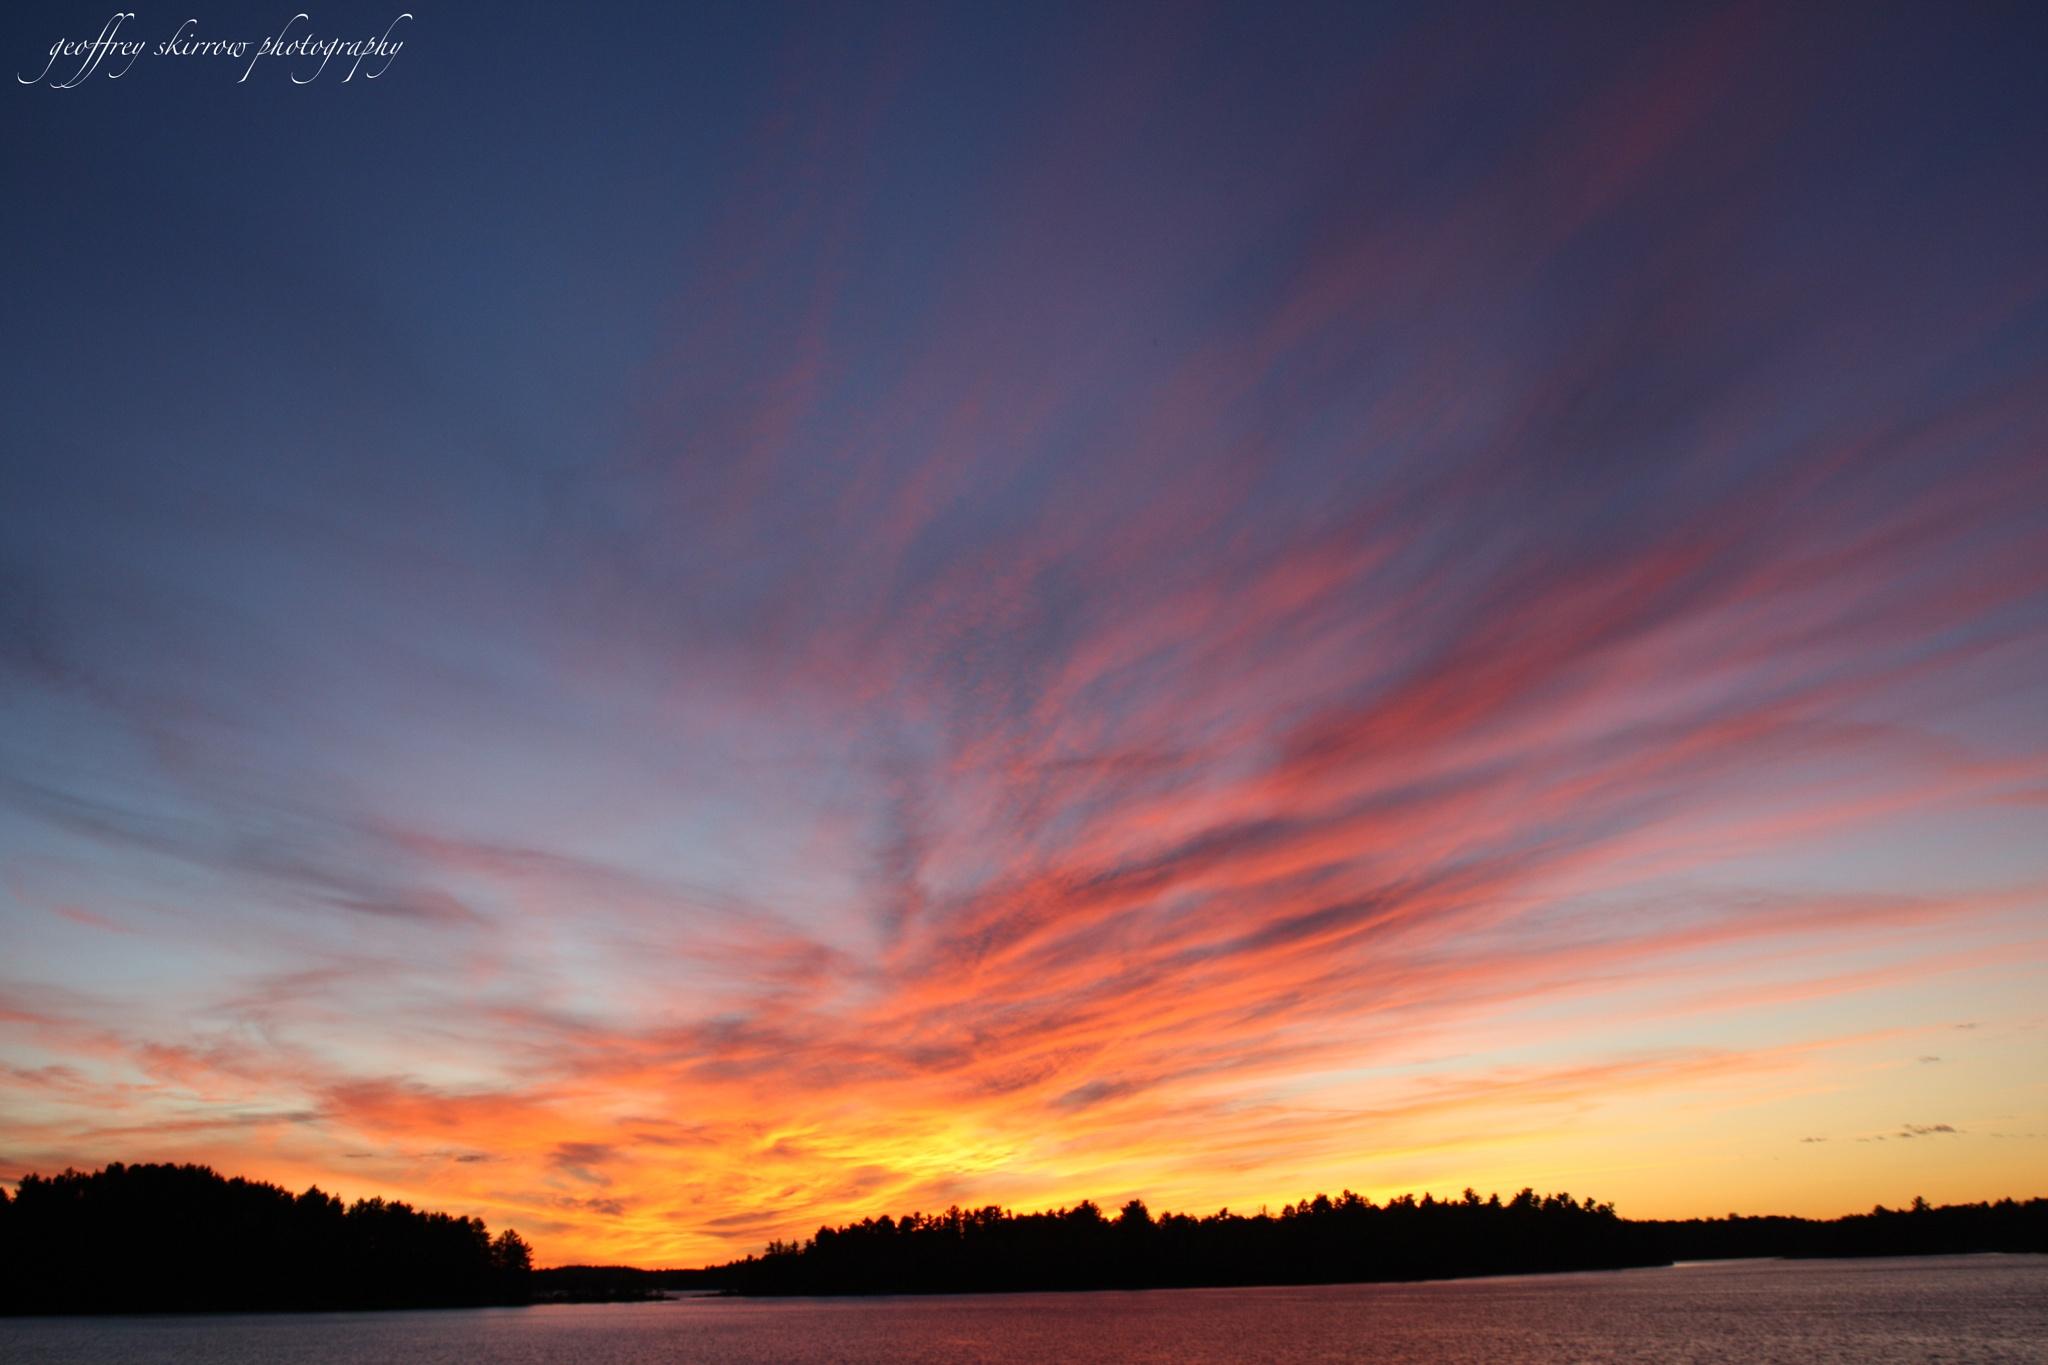 Summer Sunset on Lake Wahwashkesh, ON by geoffreyskirrow